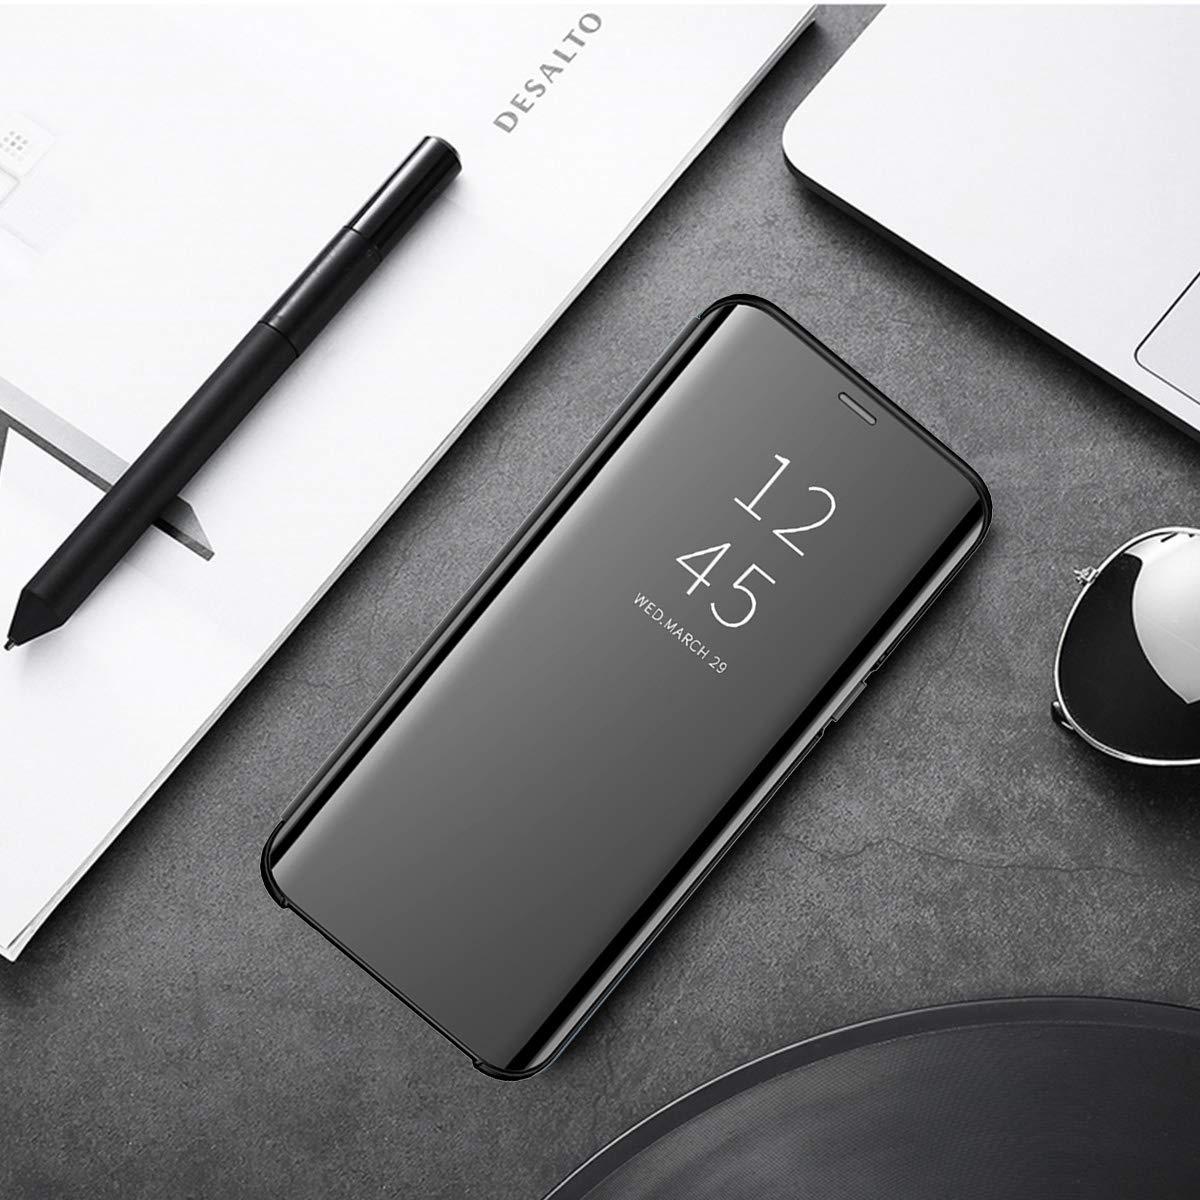 JEPER Funda Compatible con Xiaomi Mi 8 Lite Espejo PC Flip 360/° Protectora Ultra Delgado Choque Absorci/ón Anti-Ara/ñazos Mirror Case Carcasa para Mi 8 Lite Caso Estuche Cover